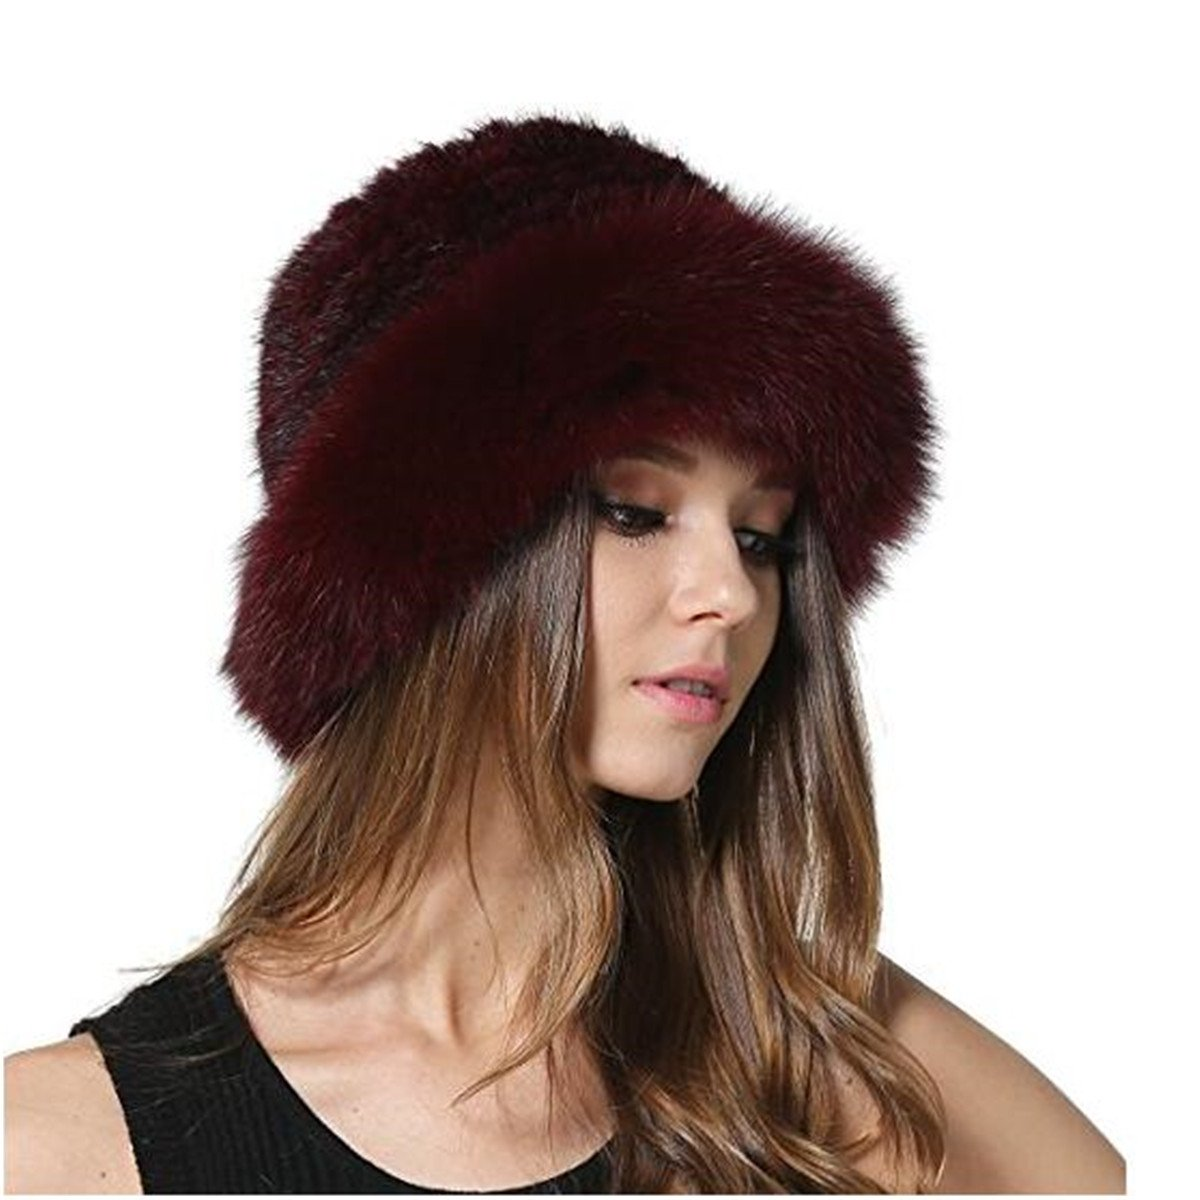 MEEFUR Winter Women's Genuine Fur Caps Knitted Real Mink Fur Hats with Fox Brim OneSize) AORUI00831A-Black-Onesize